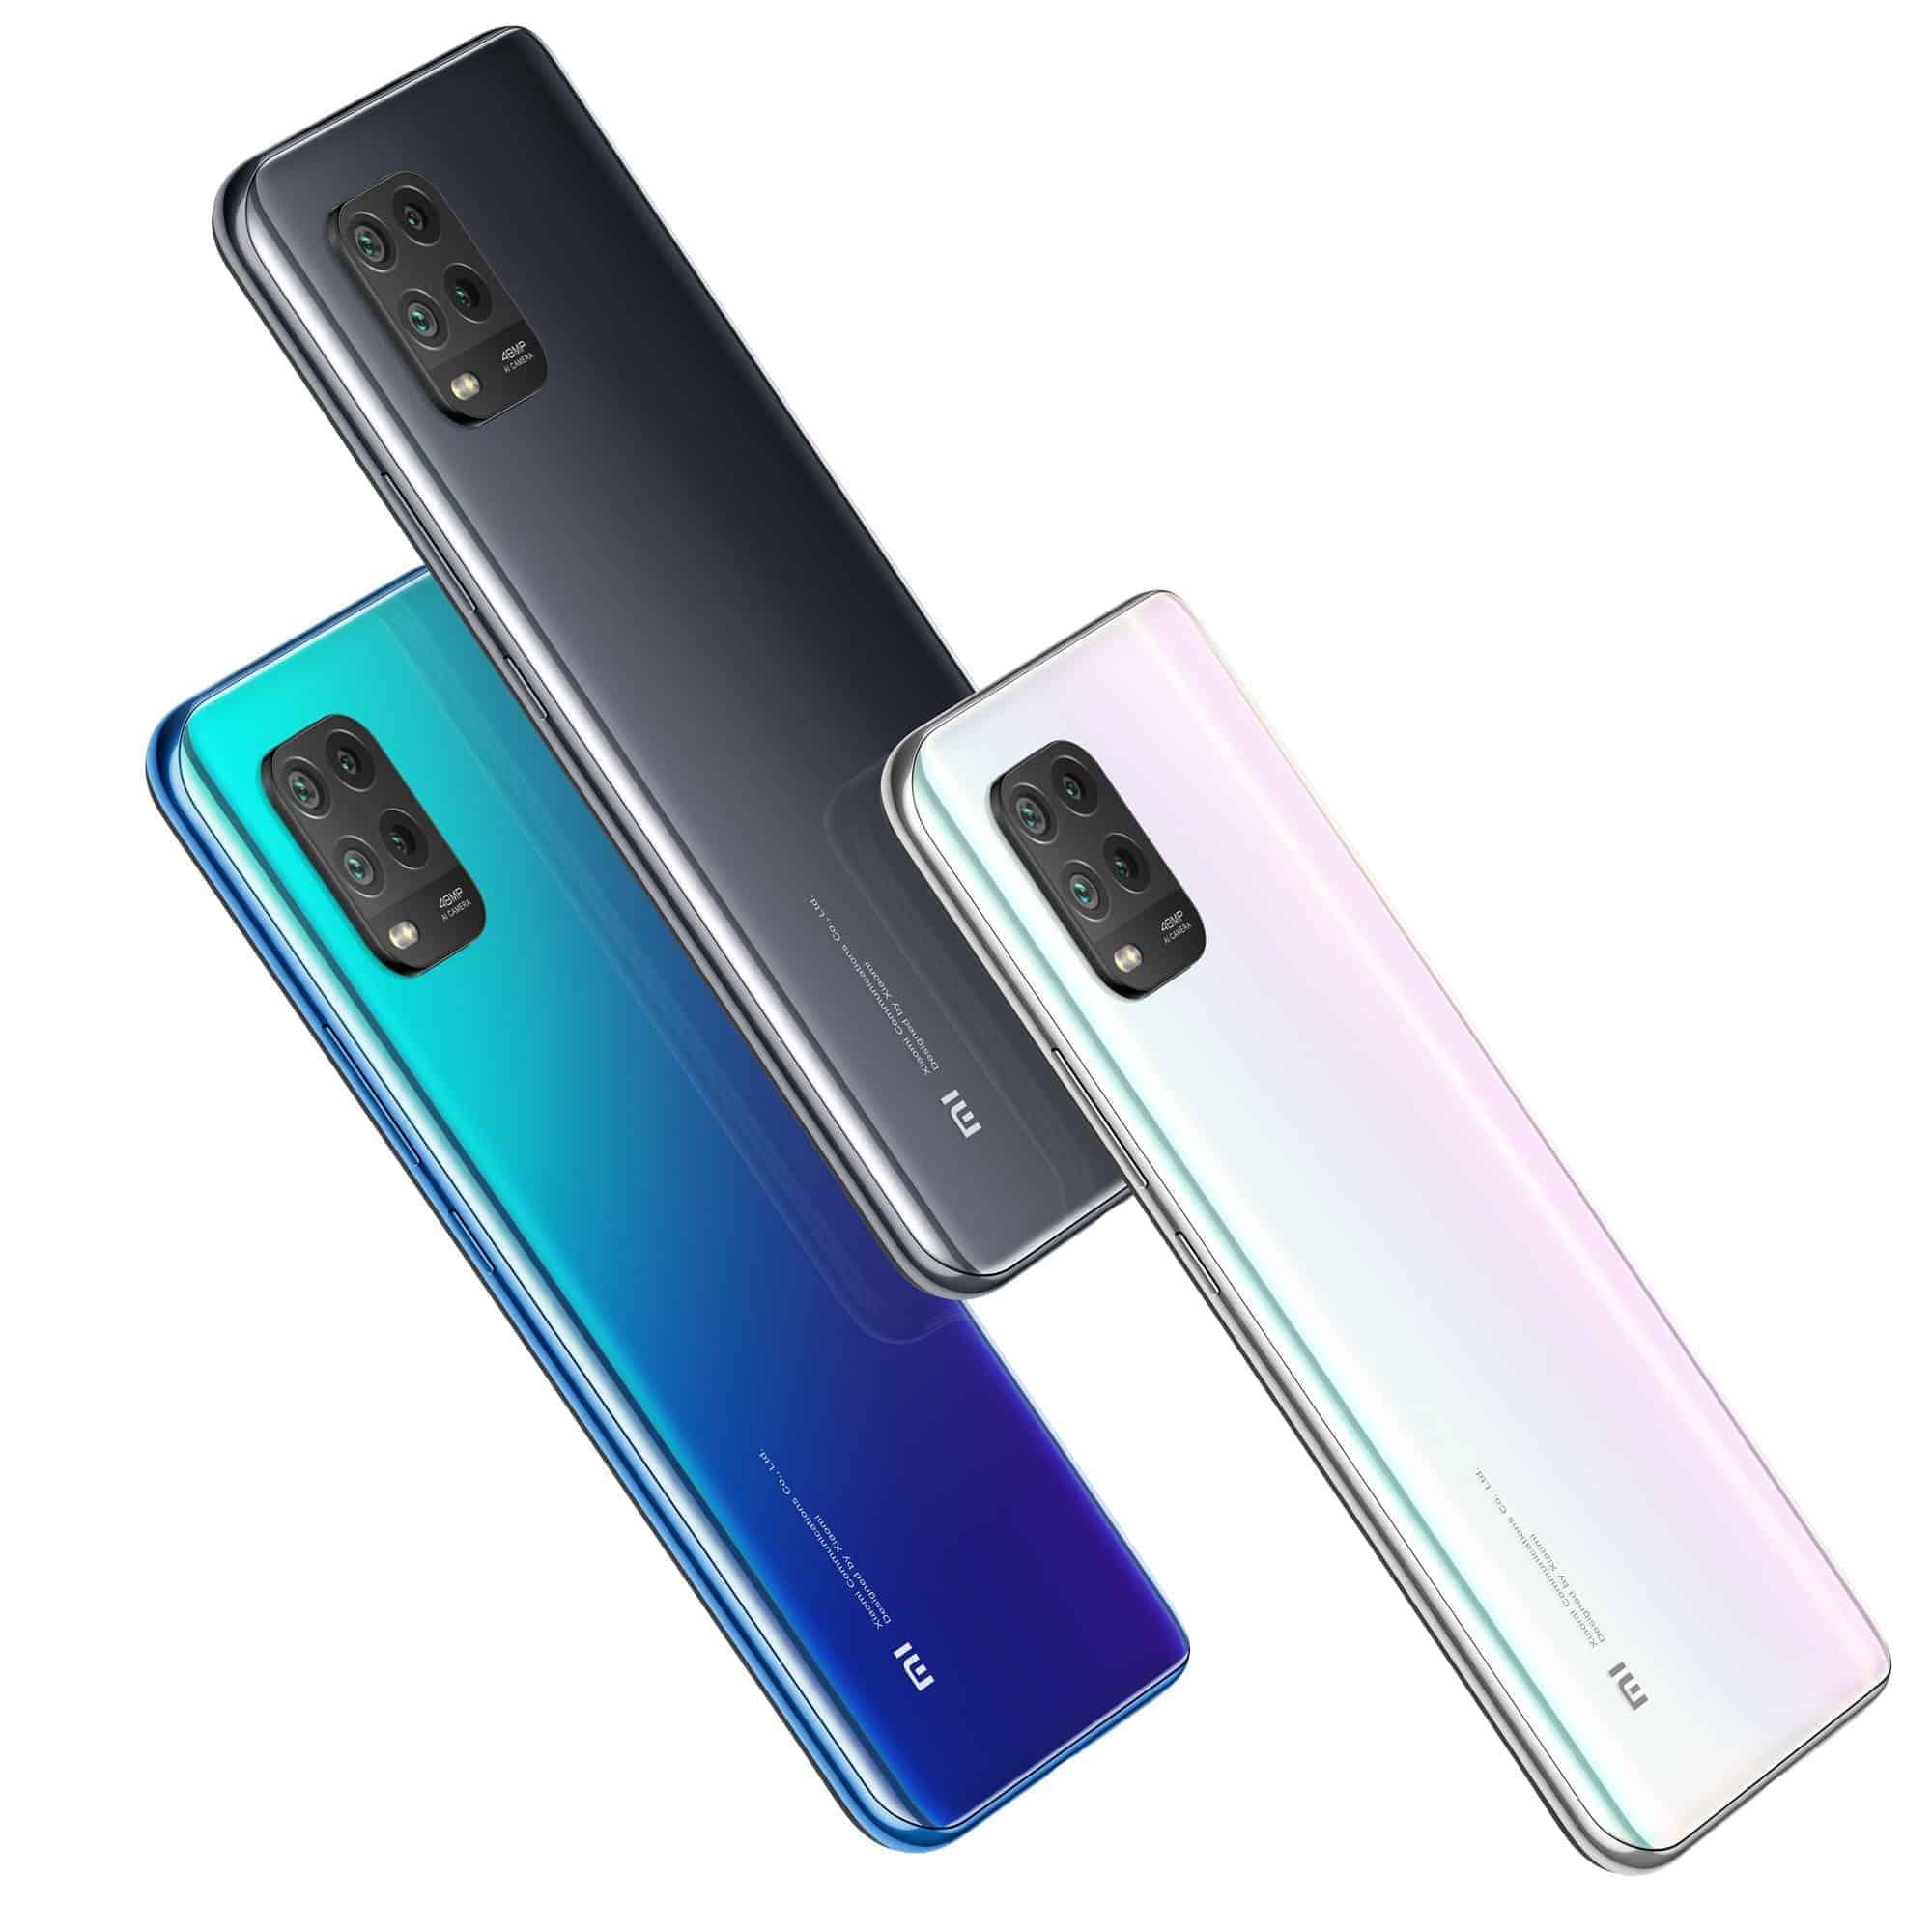 Xiaomi Mi 10 Lite image 1